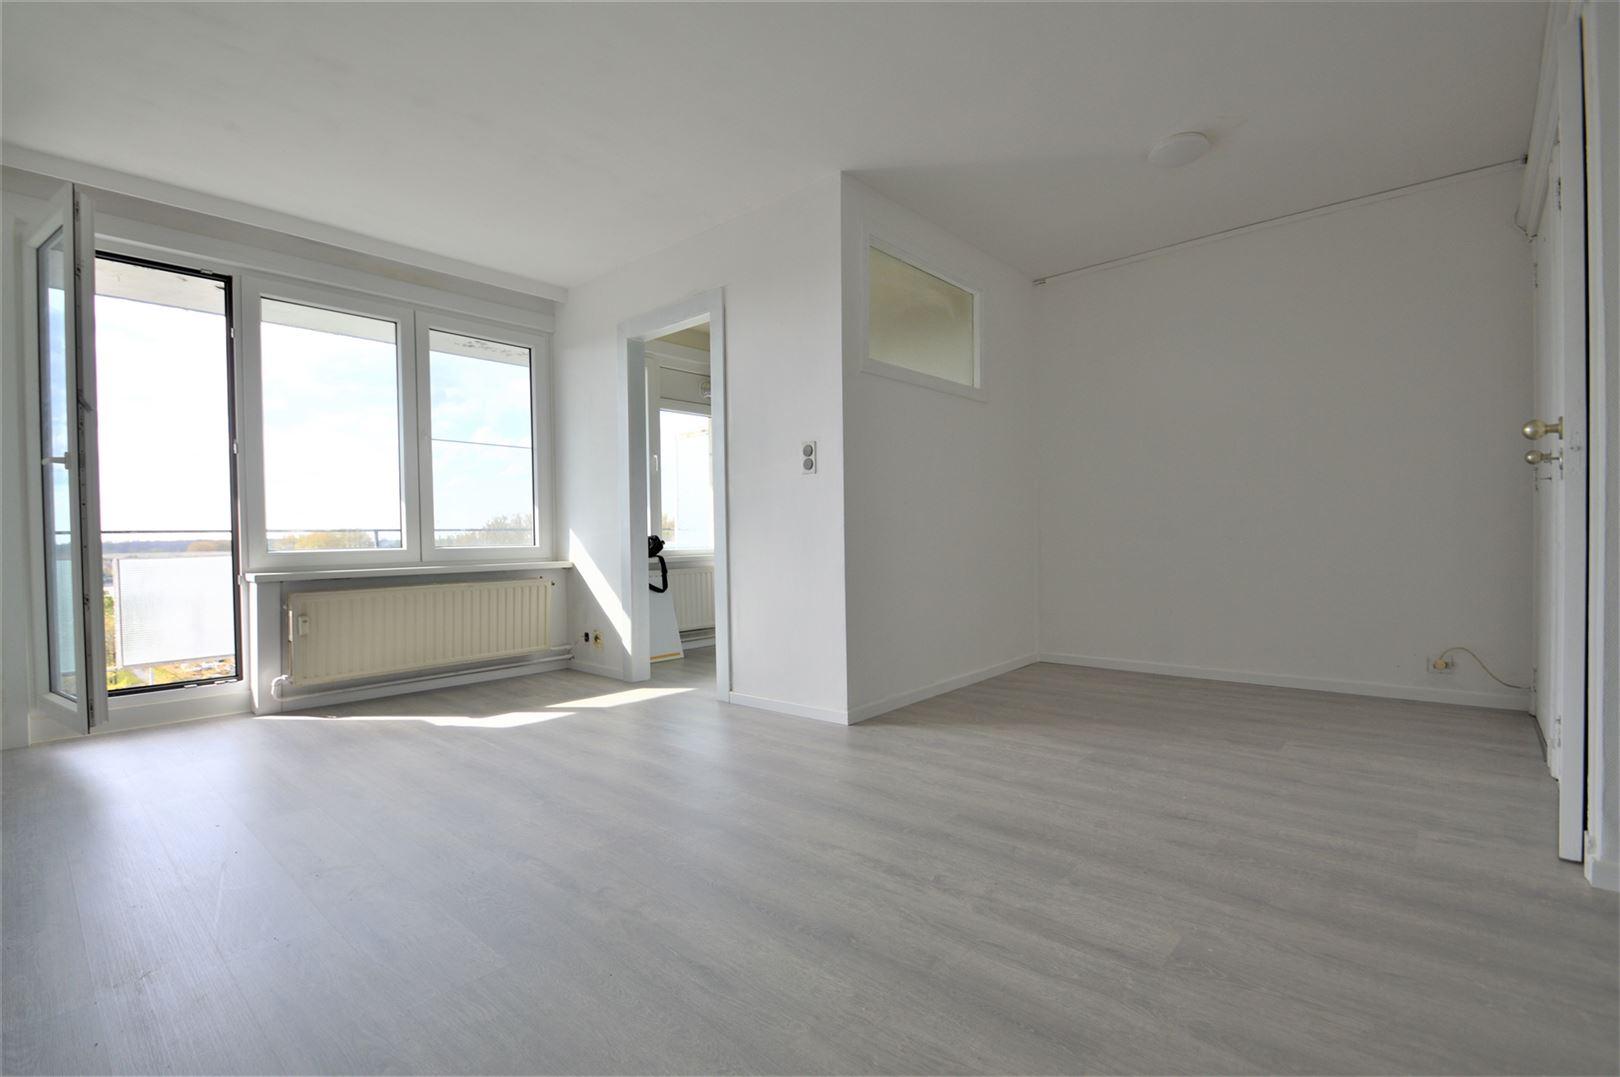 Foto 6 : Flat/studio te 9200 Dendermonde (België) - Prijs € 500